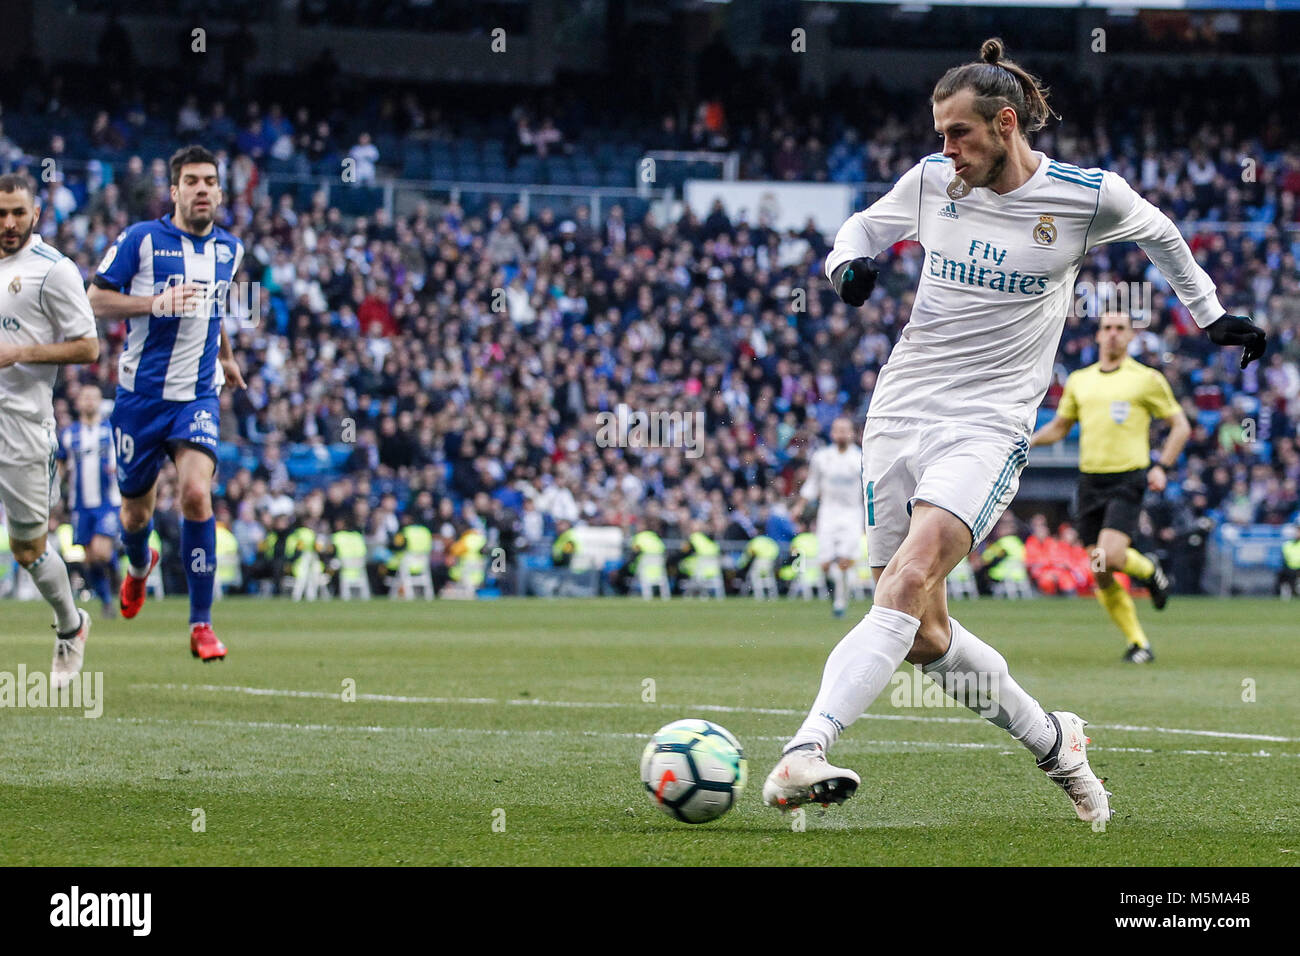 Gareth Bale (Real Madrid) scores to make it (2, 0) La Liga match Stock  Photo - Alamy